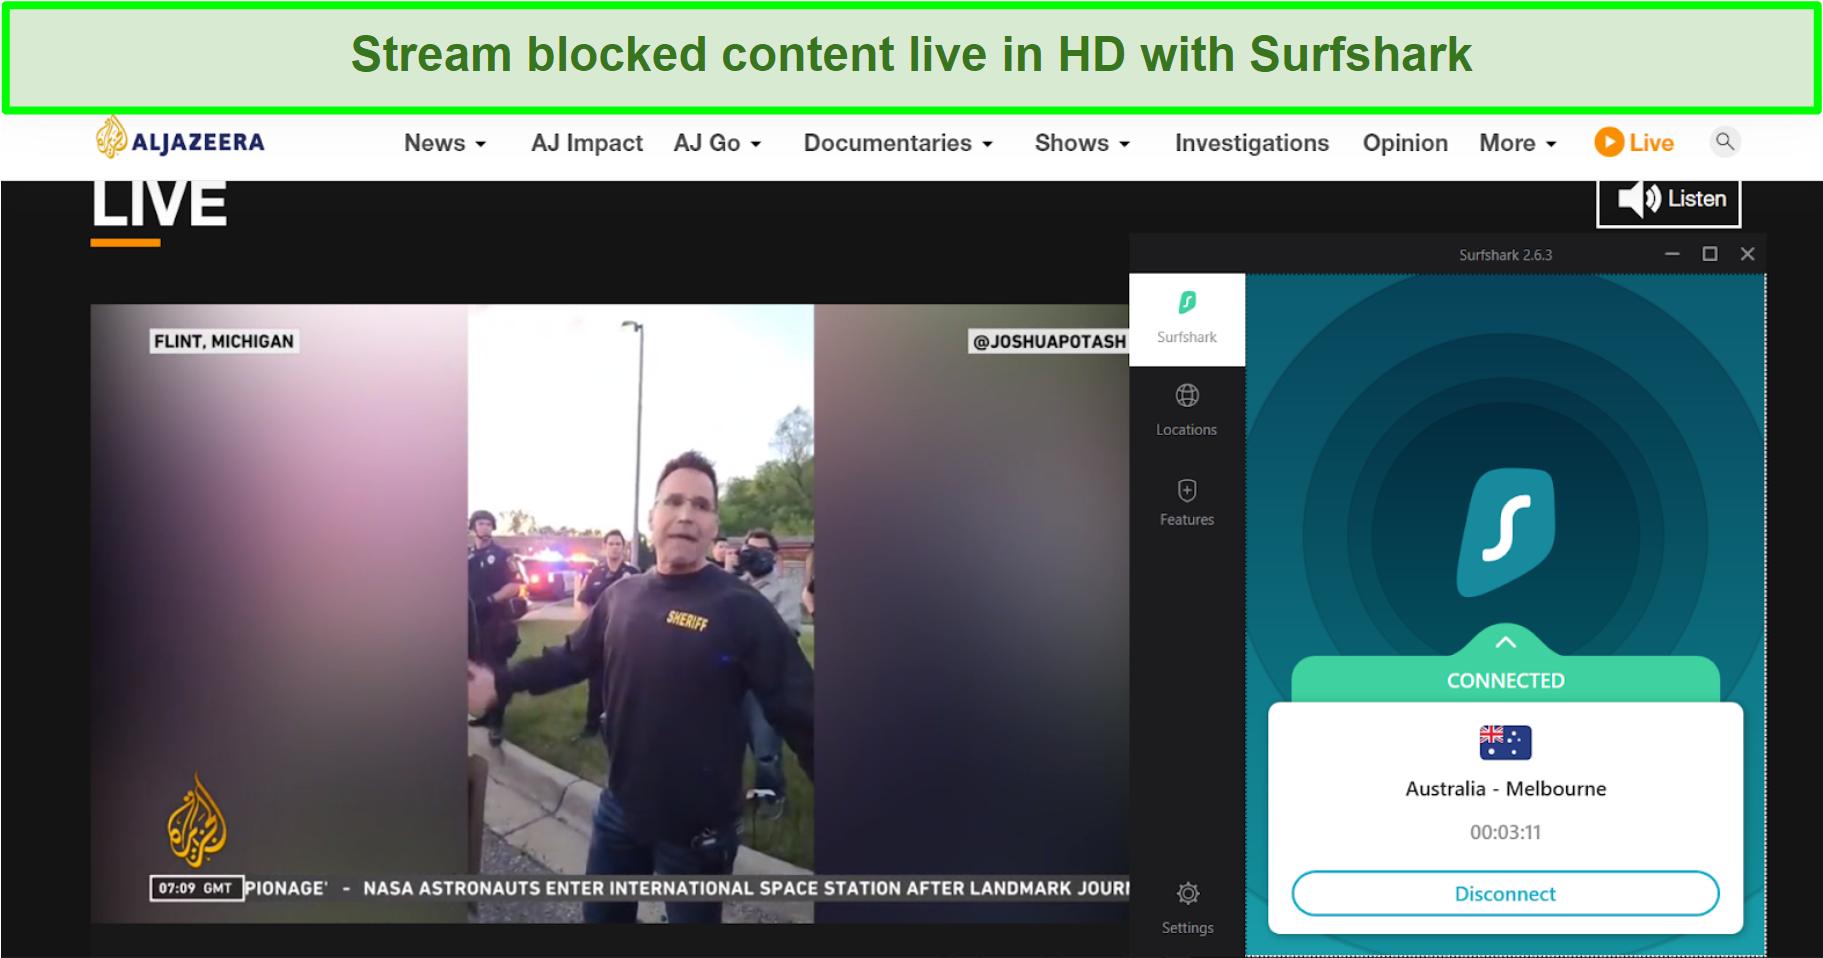 Screenshot of Al Jazeera news live playing and Surfshark connected